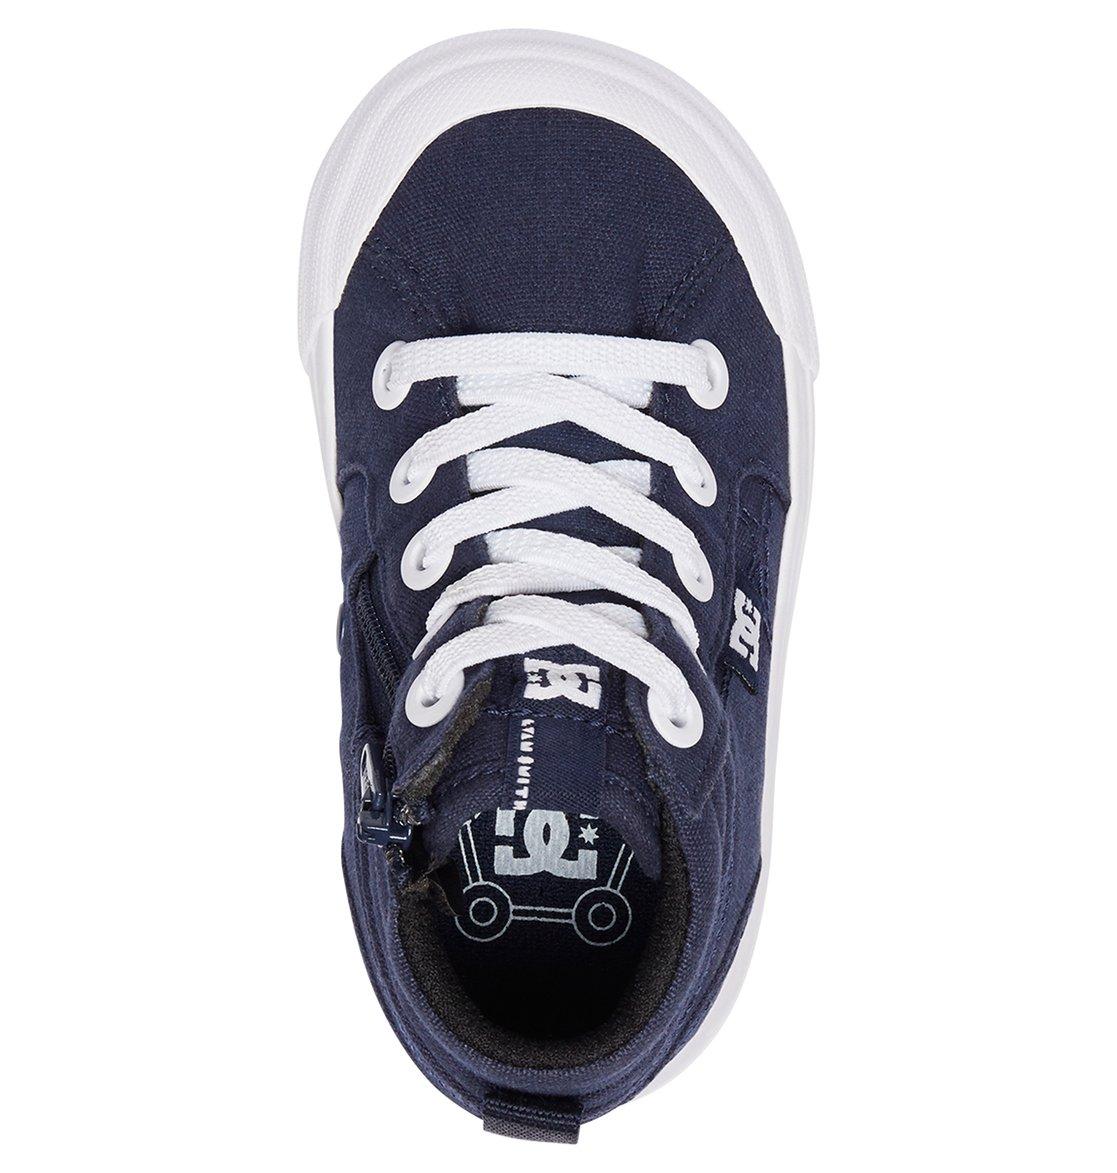 Dc Shoes - Dc Shoes Toddler S Evan Hi Adts300025 Navy